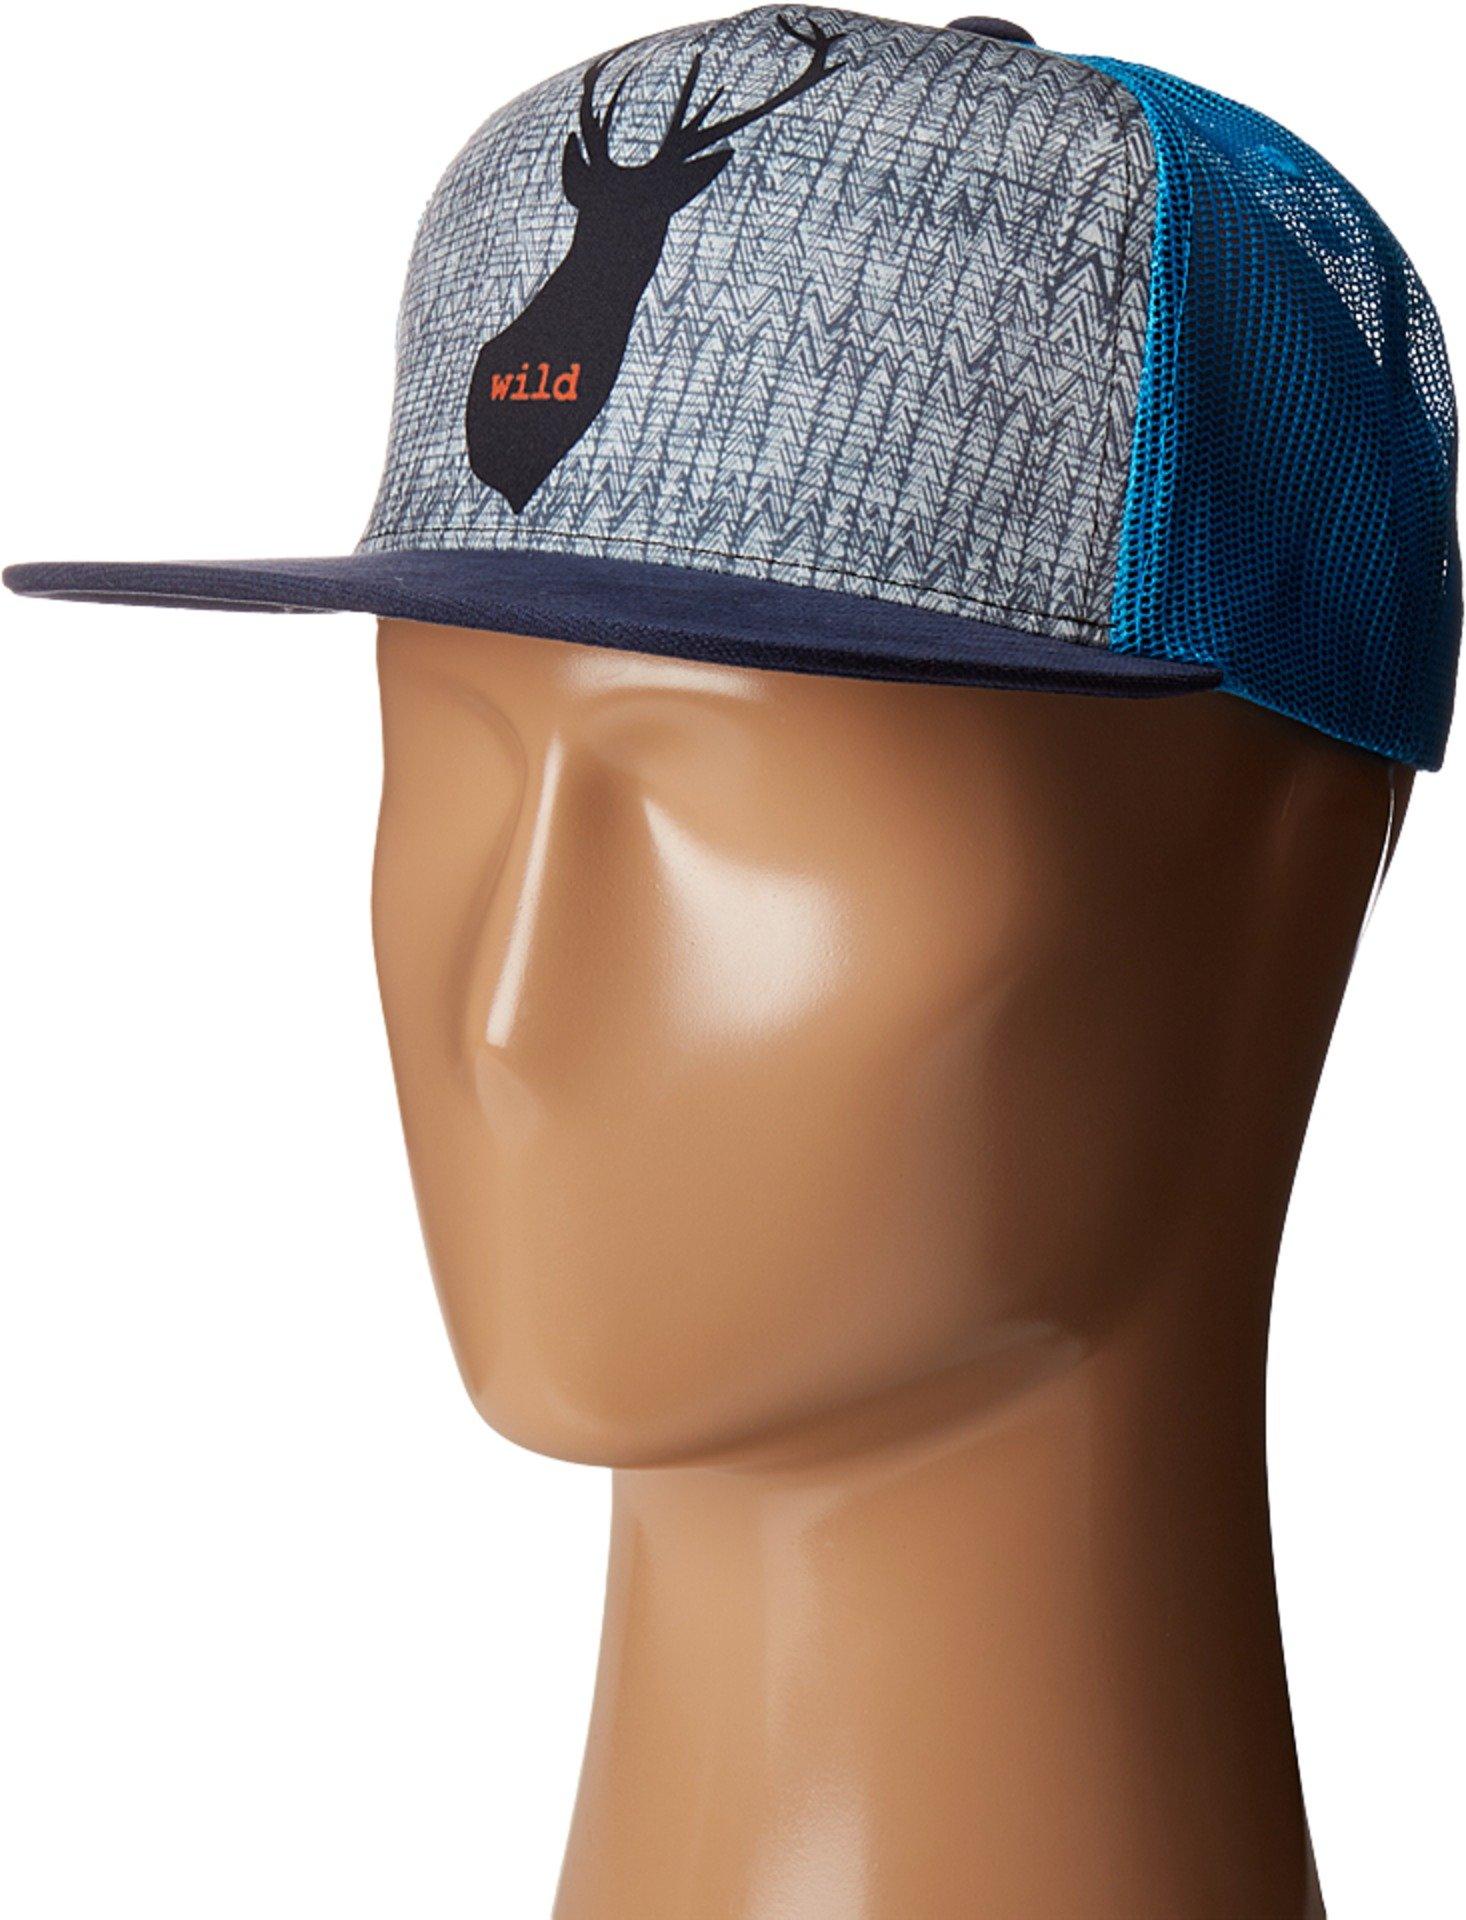 9999f5113bd prAna Men s Journeyman Trucker Hat